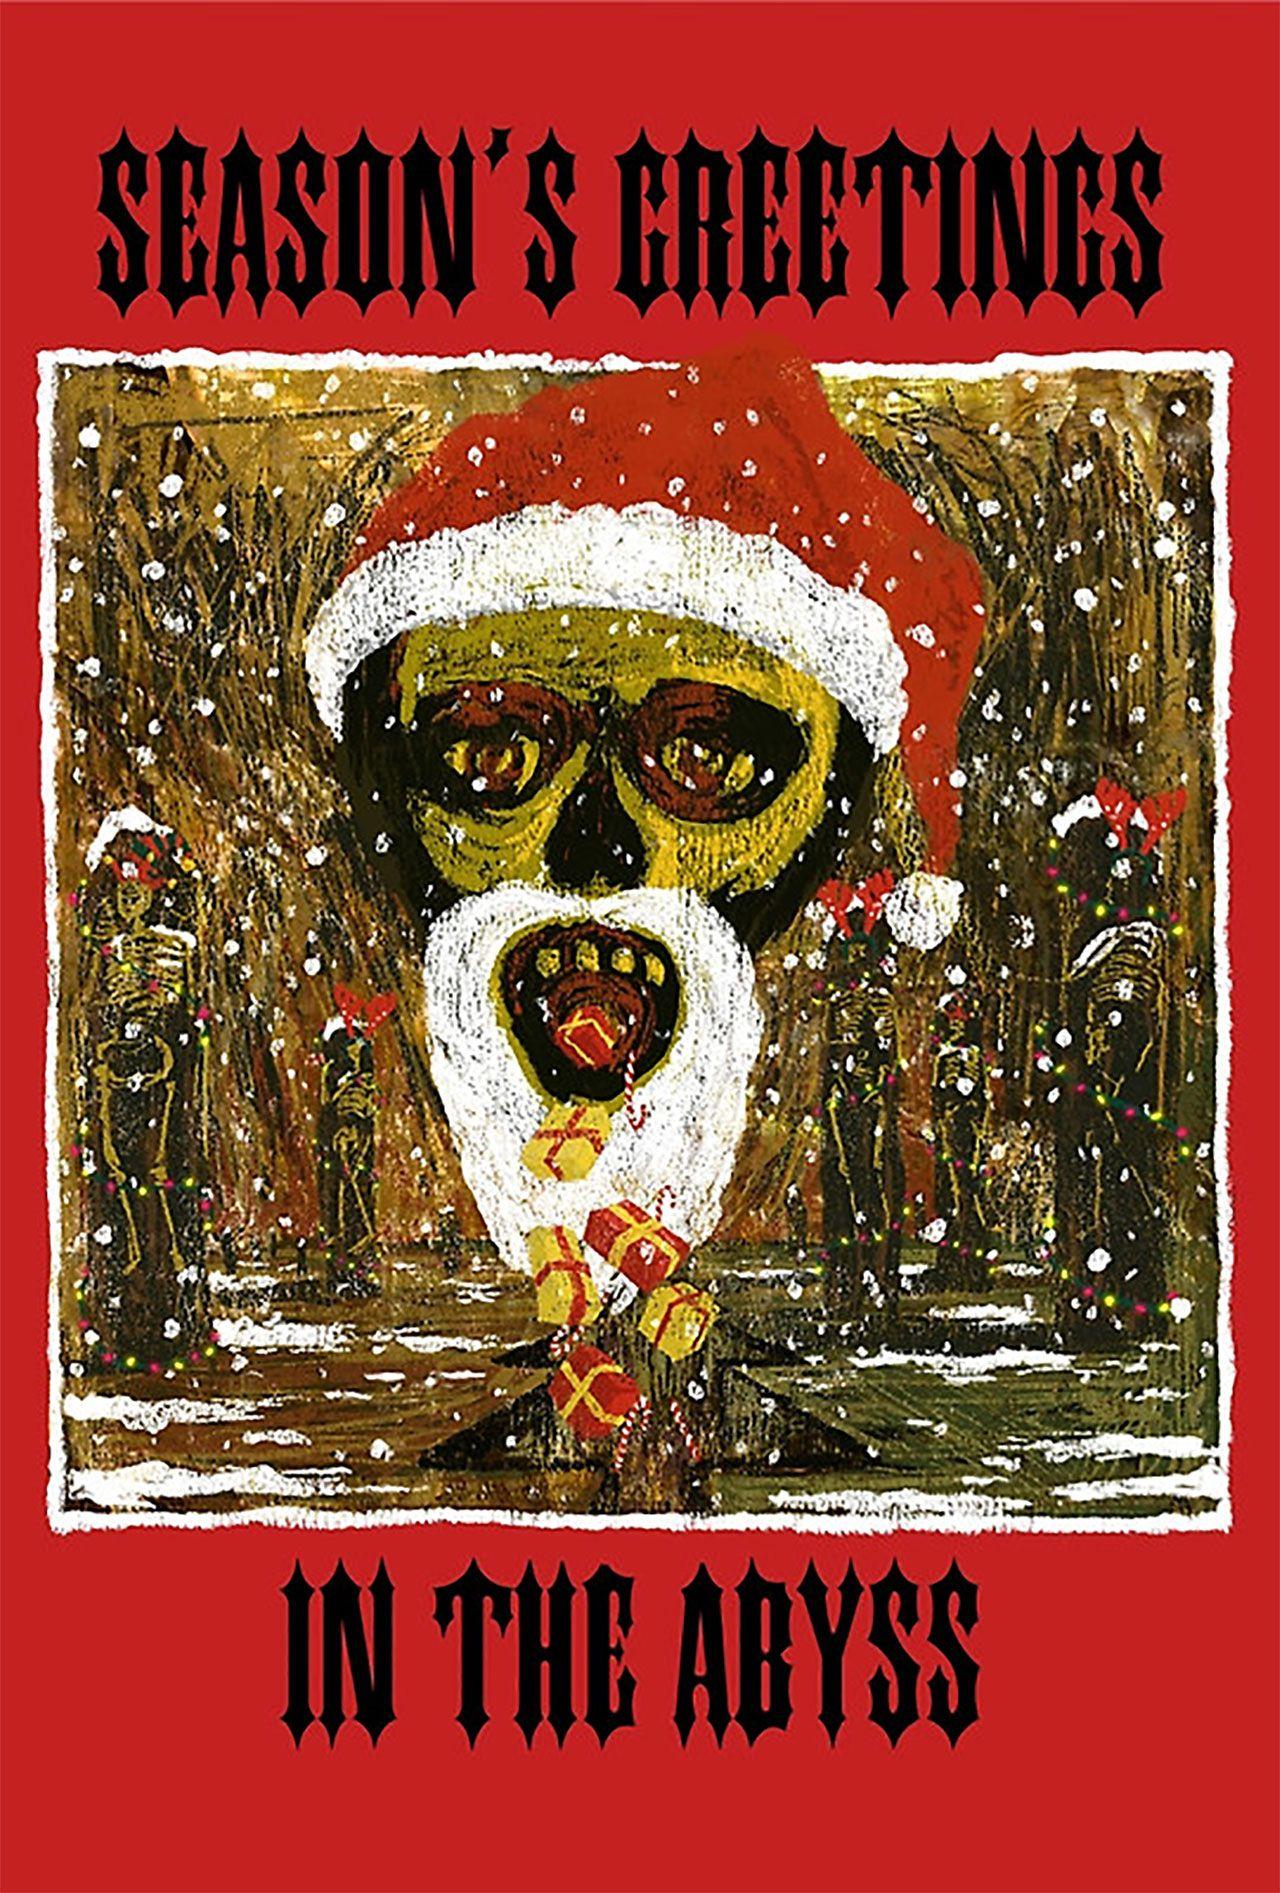 Seasons Greetings In The Abyss Heavy metal christmas